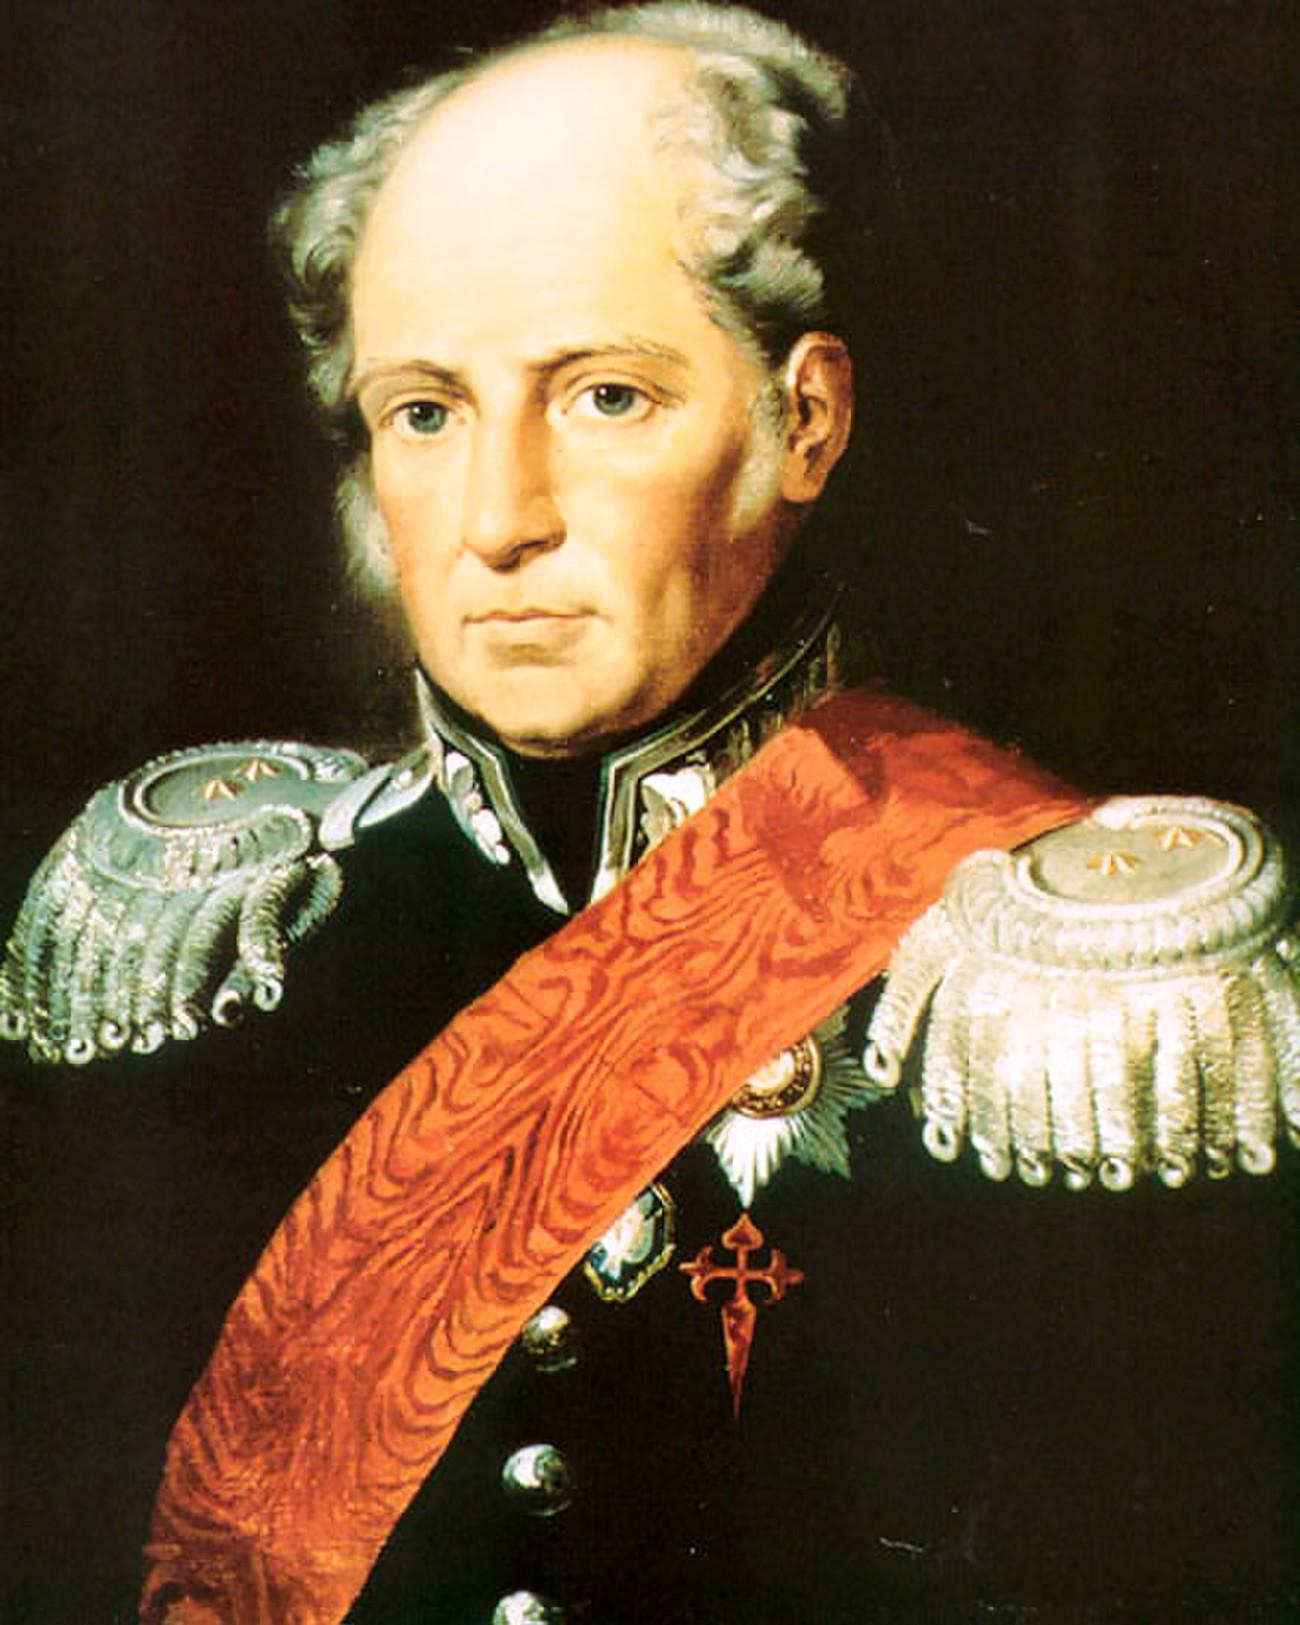 Agustin de Betancourt